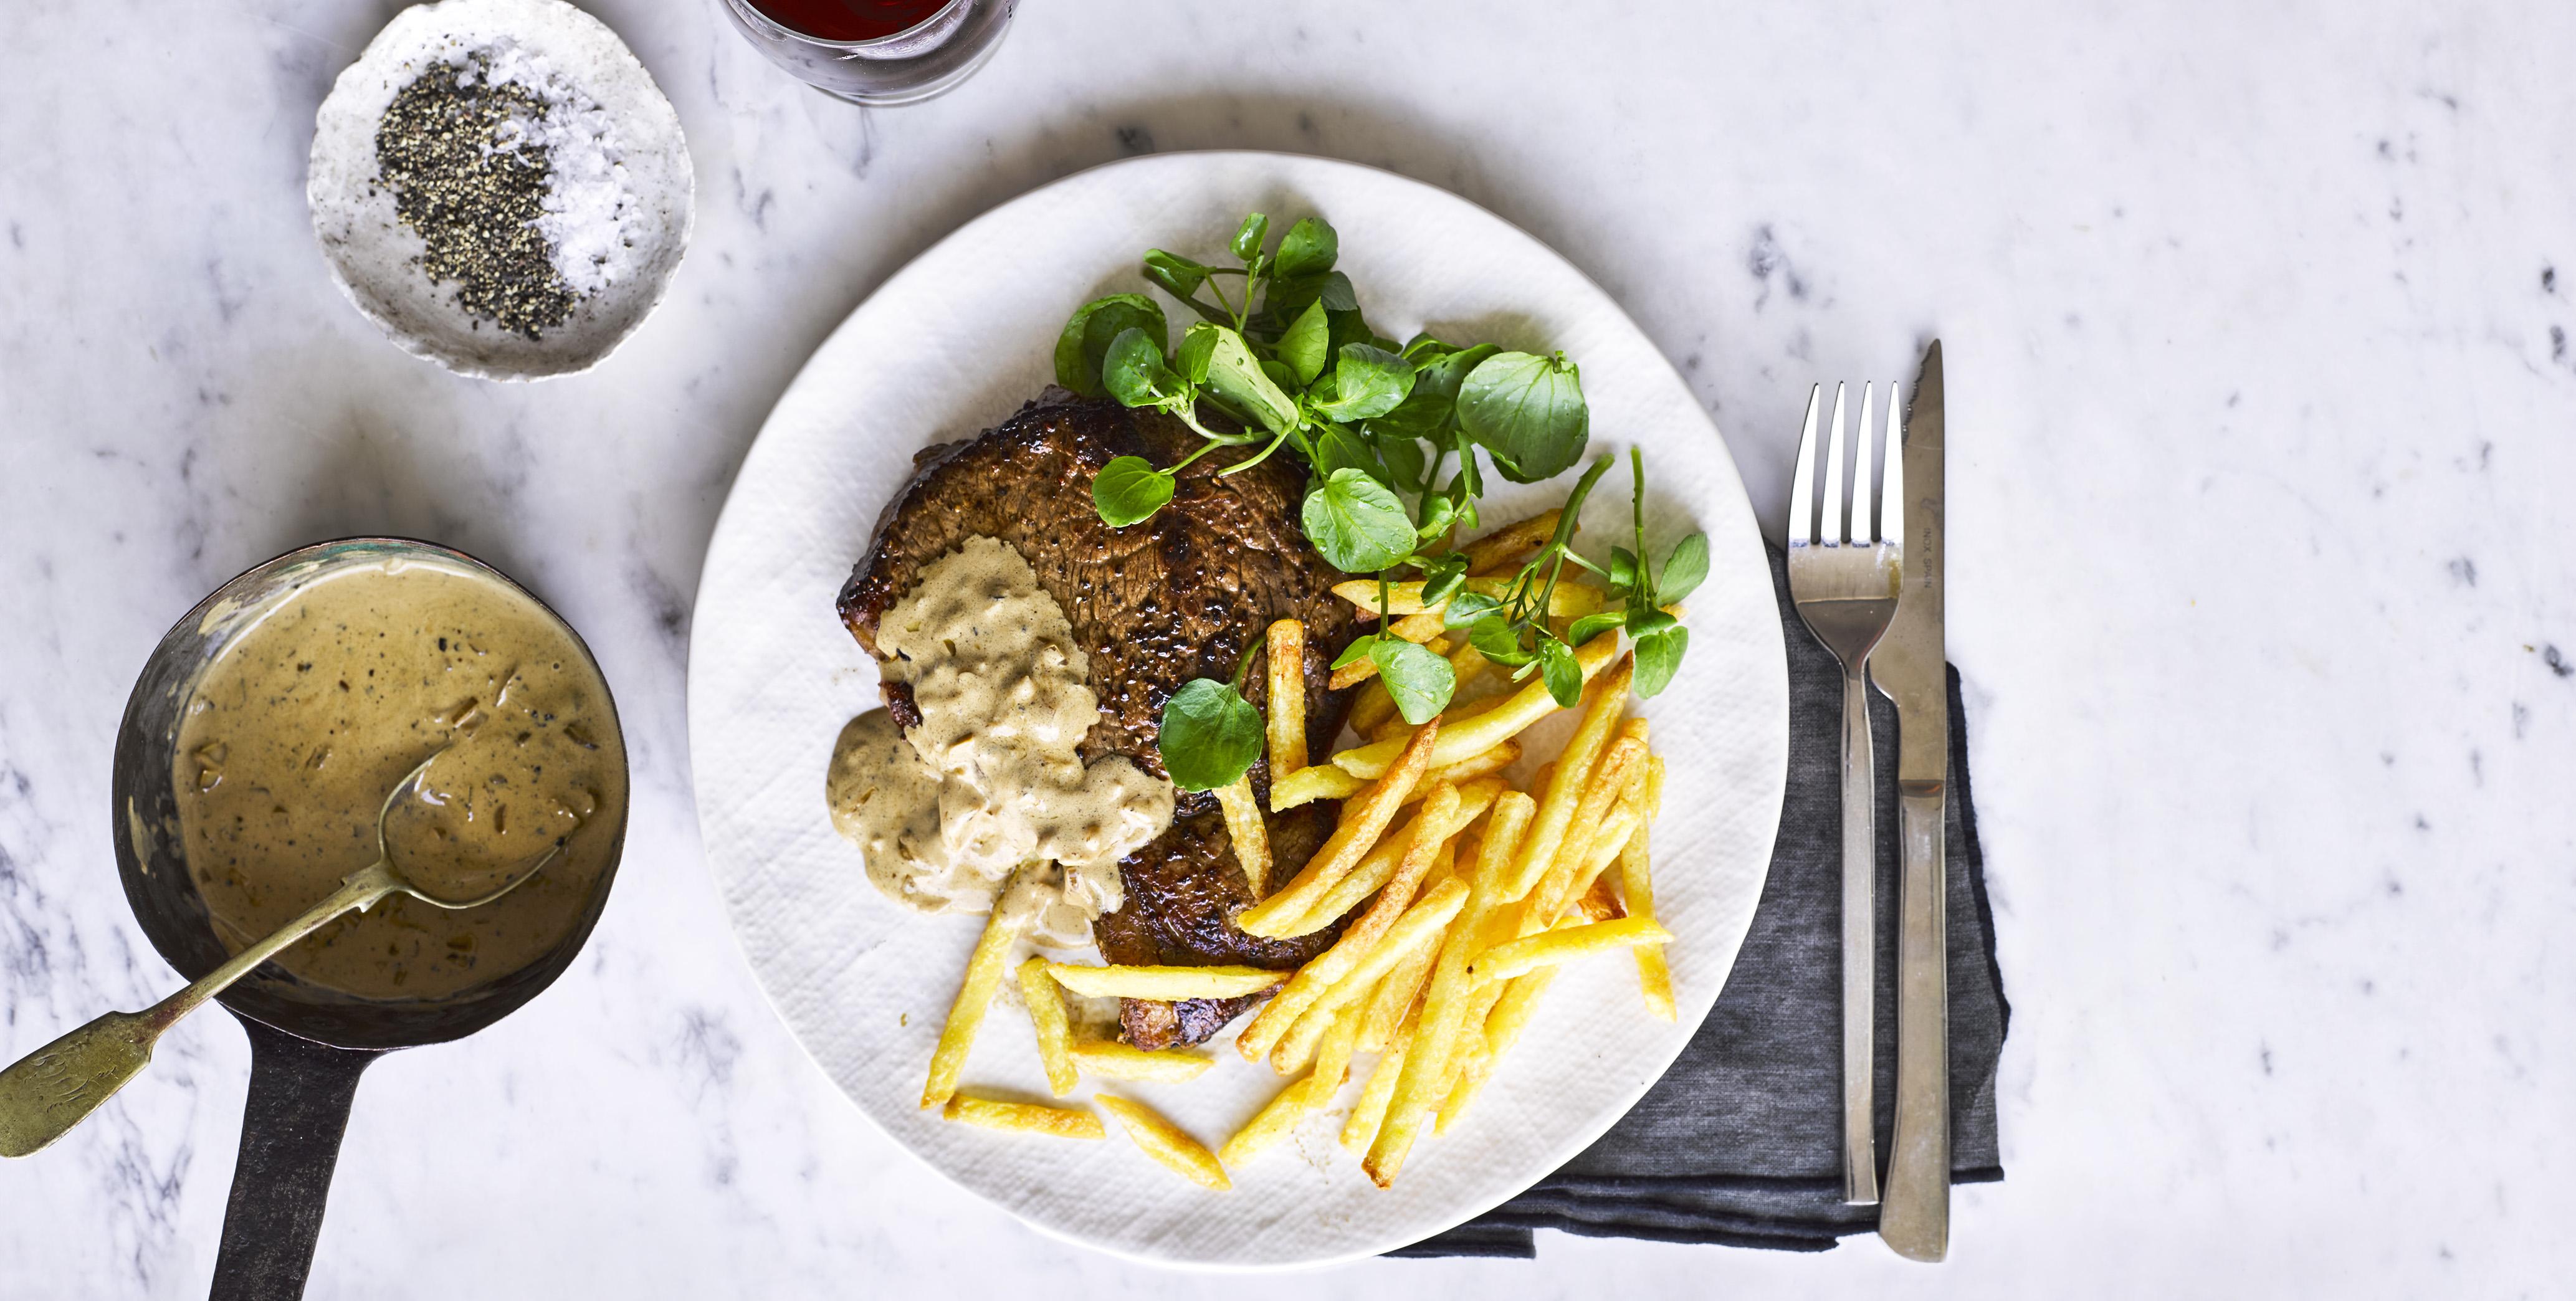 steak with creamy peppercorn steak